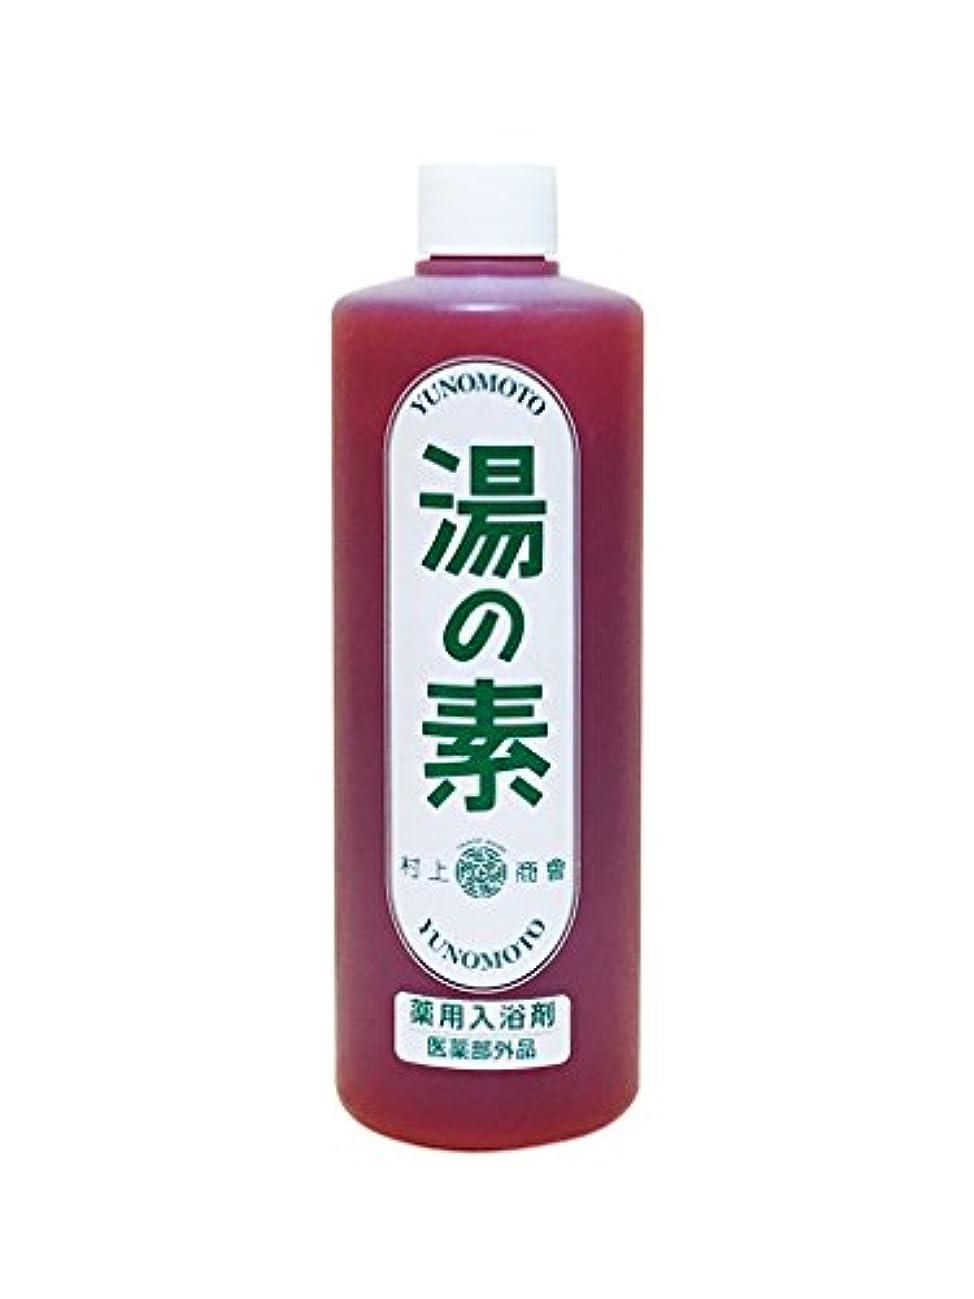 作動する電卓誇張硫黄乳白色湯 湯の素 薬用入浴剤 (医薬部外品) 490g